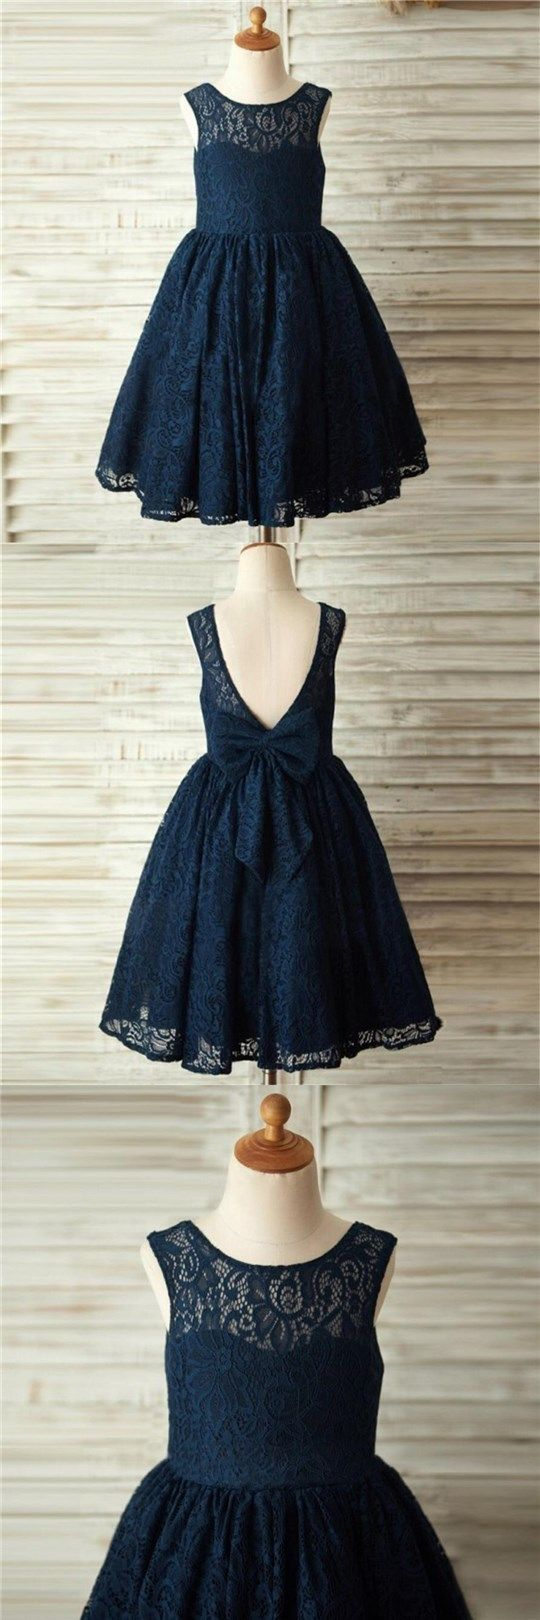 Navy Blue Lace Lovely Cute Flower Girl Dresses with bow , Junior Bridesmaid Dresses, FG084 #spisabridal#flowergirldress#wedding